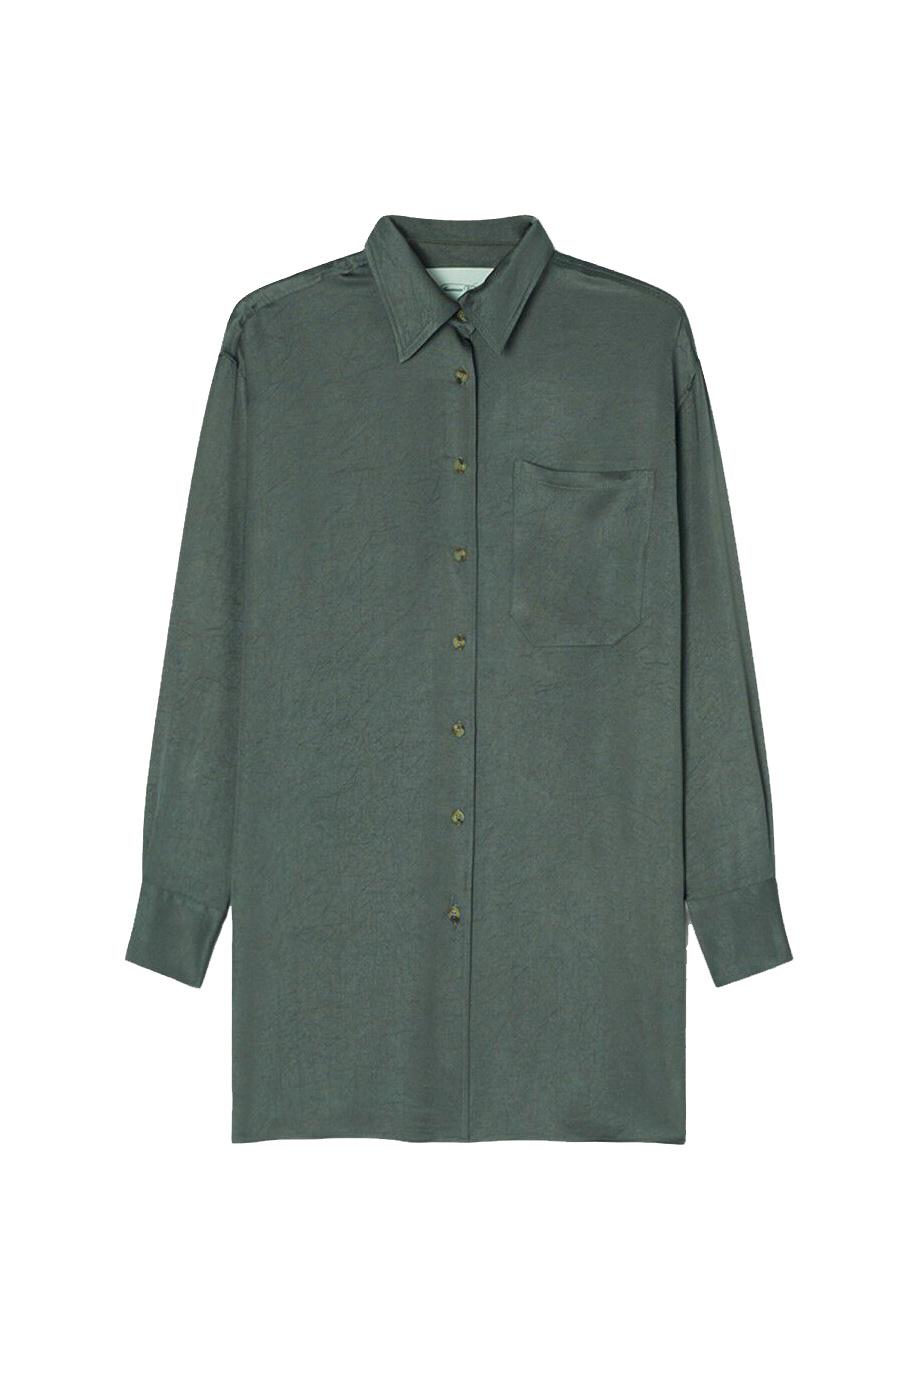 Widland Shirt - Metal-1